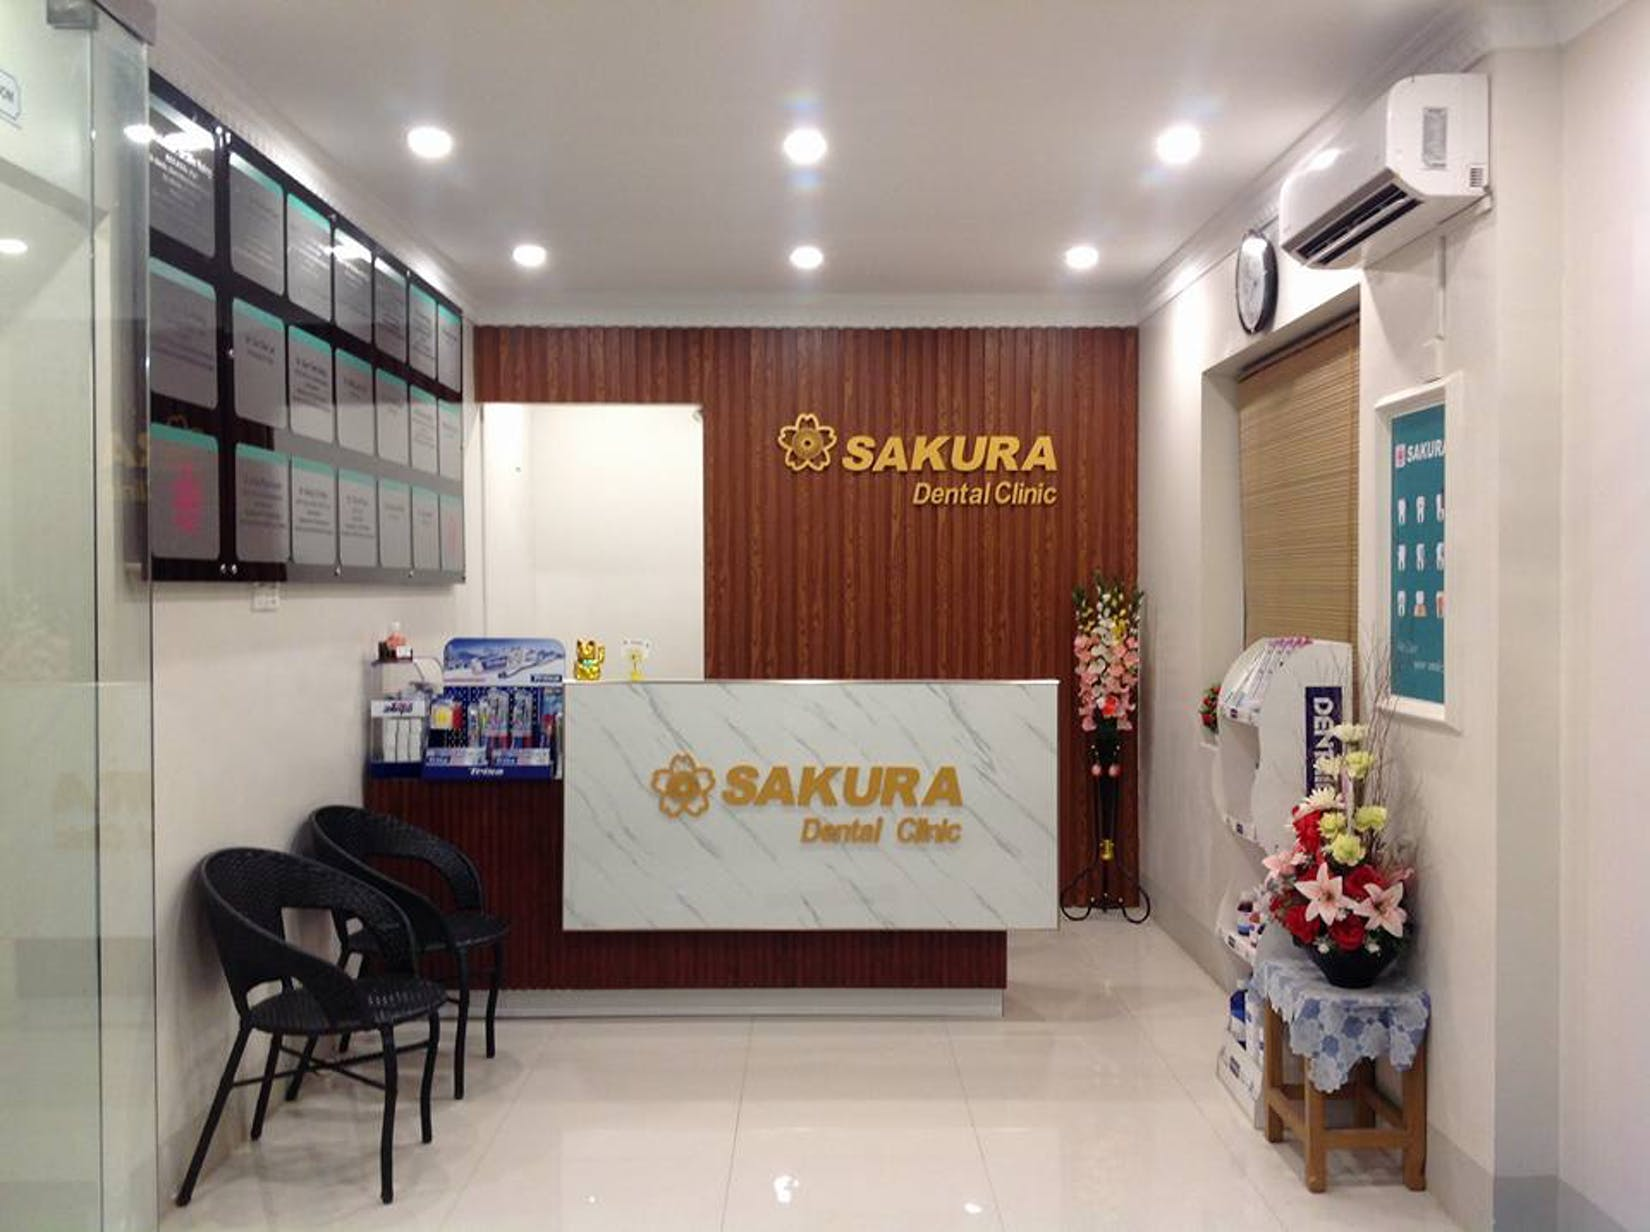 Sakura Dental Clinic - North Dagon | Beauty